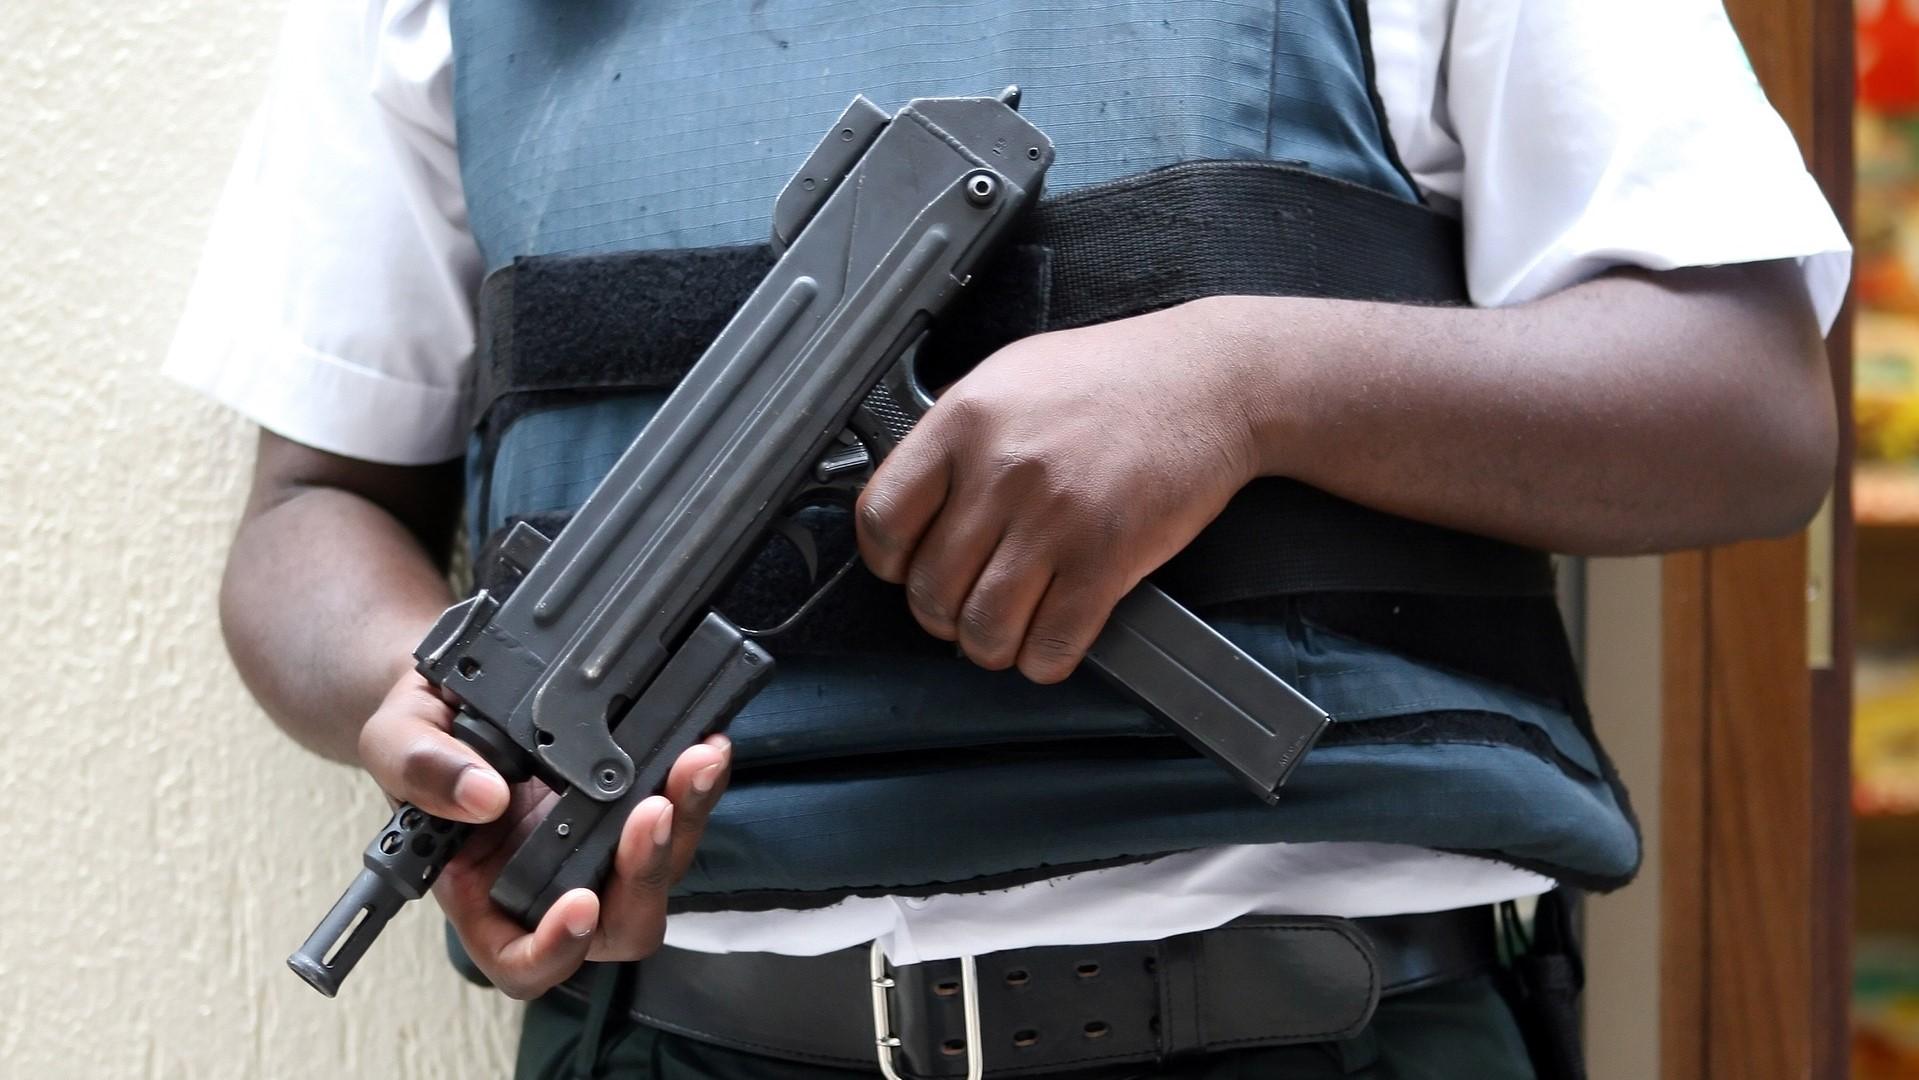 tougher sentences on terrorism offences